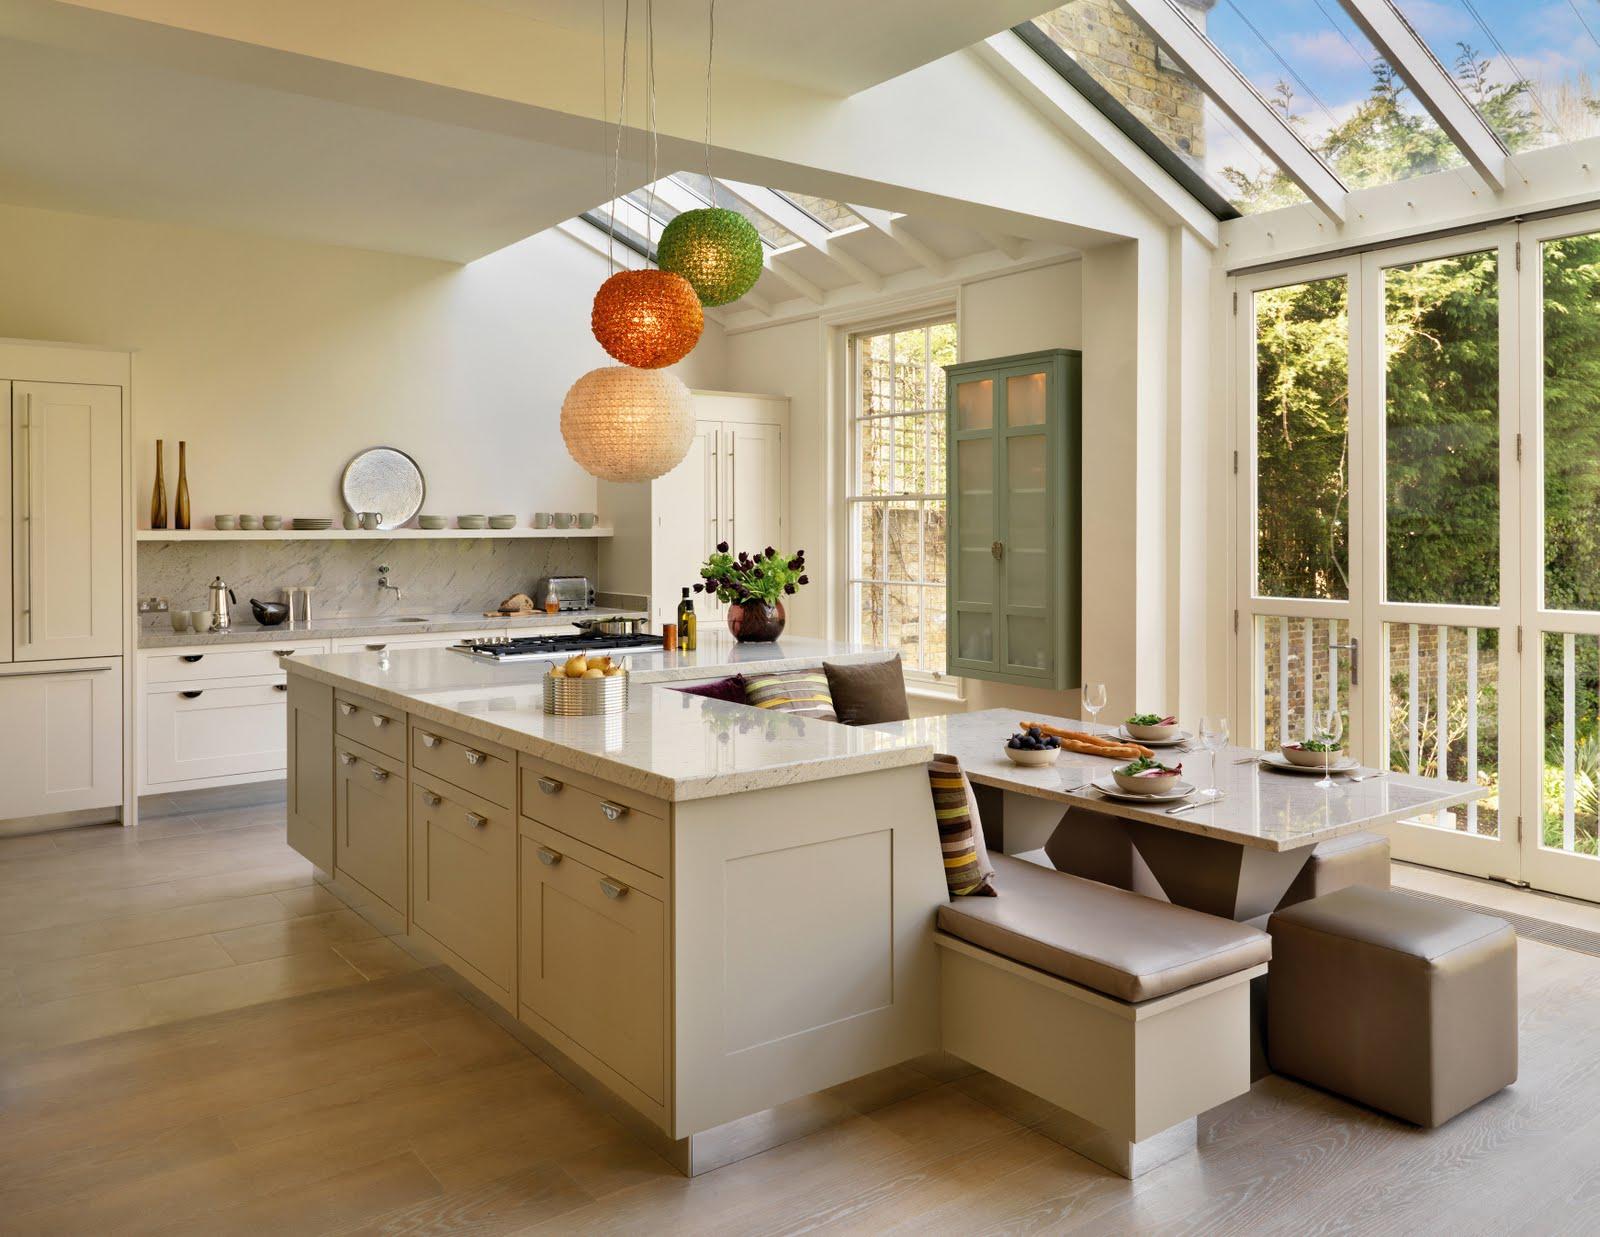 Kitchen island with wine rack photo - 2